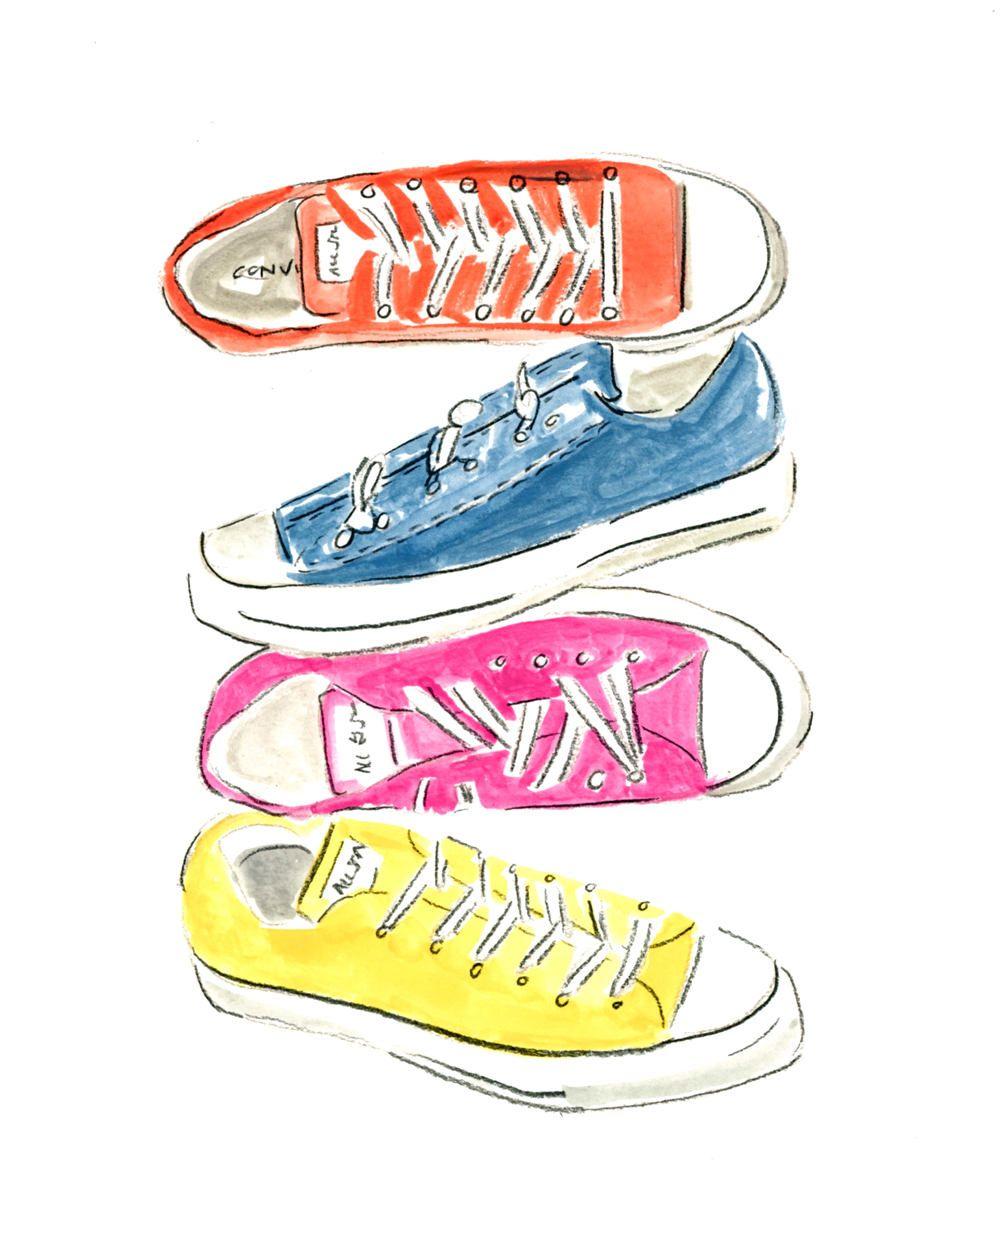 c0589bdf4283b Converse Sneakers, Instant Art Print, Fashion Print, Shoe Art ...